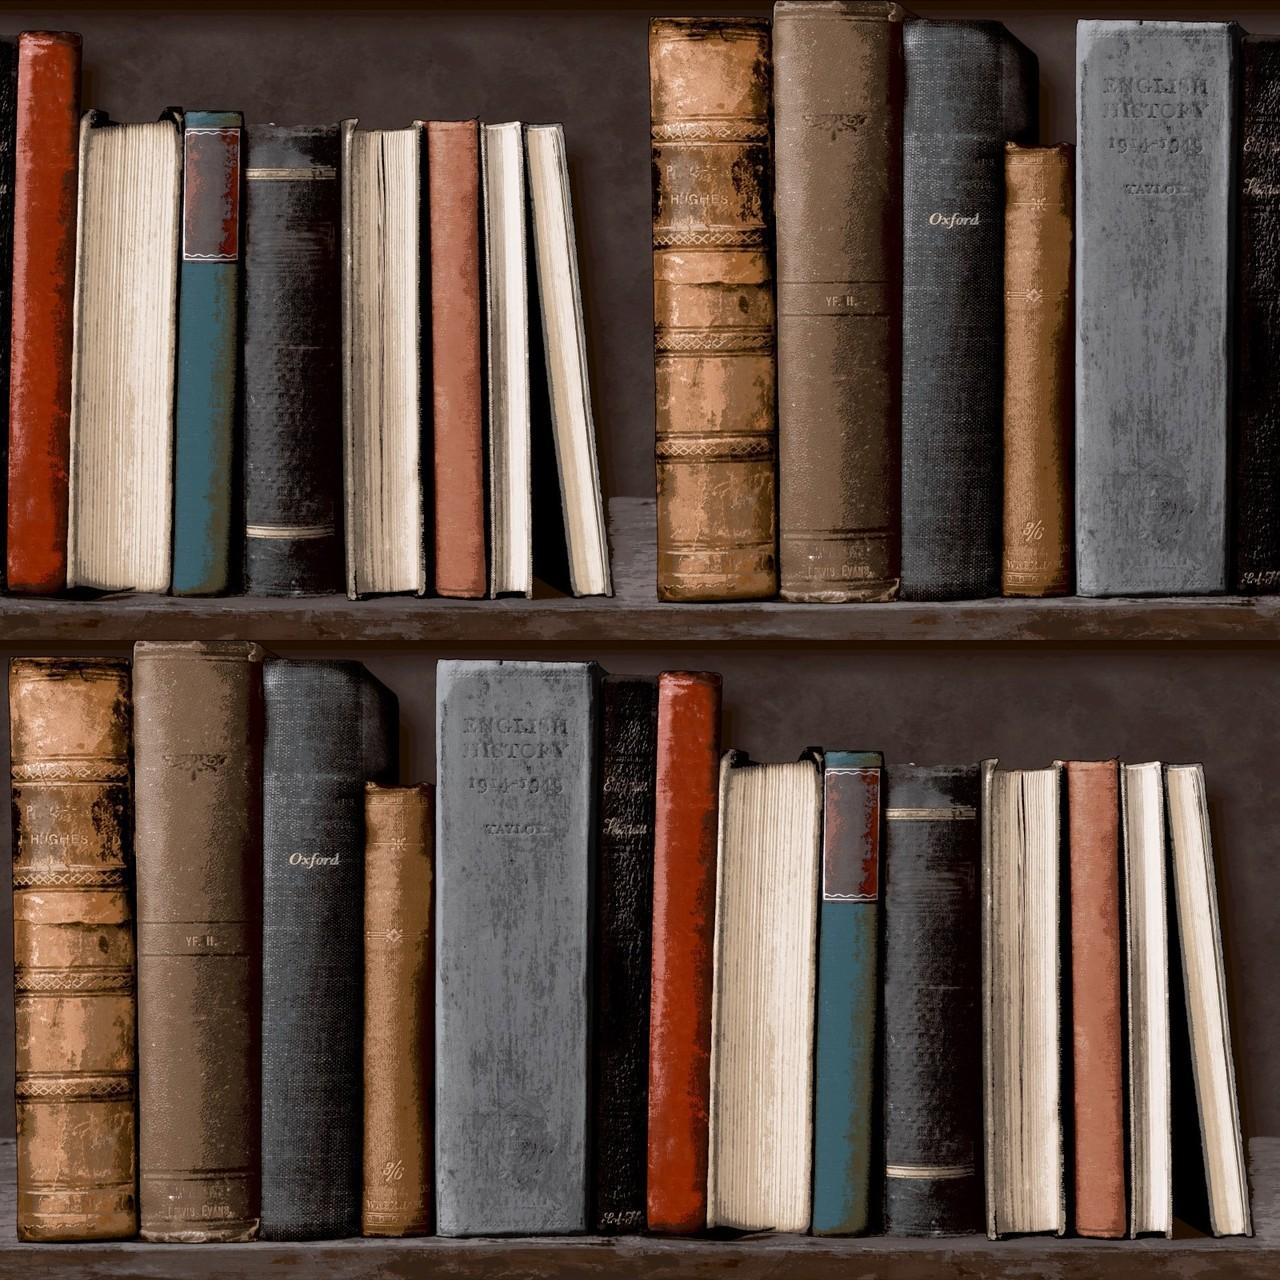 43 Library Bookshelf Wallpaper On Wallpapersafari